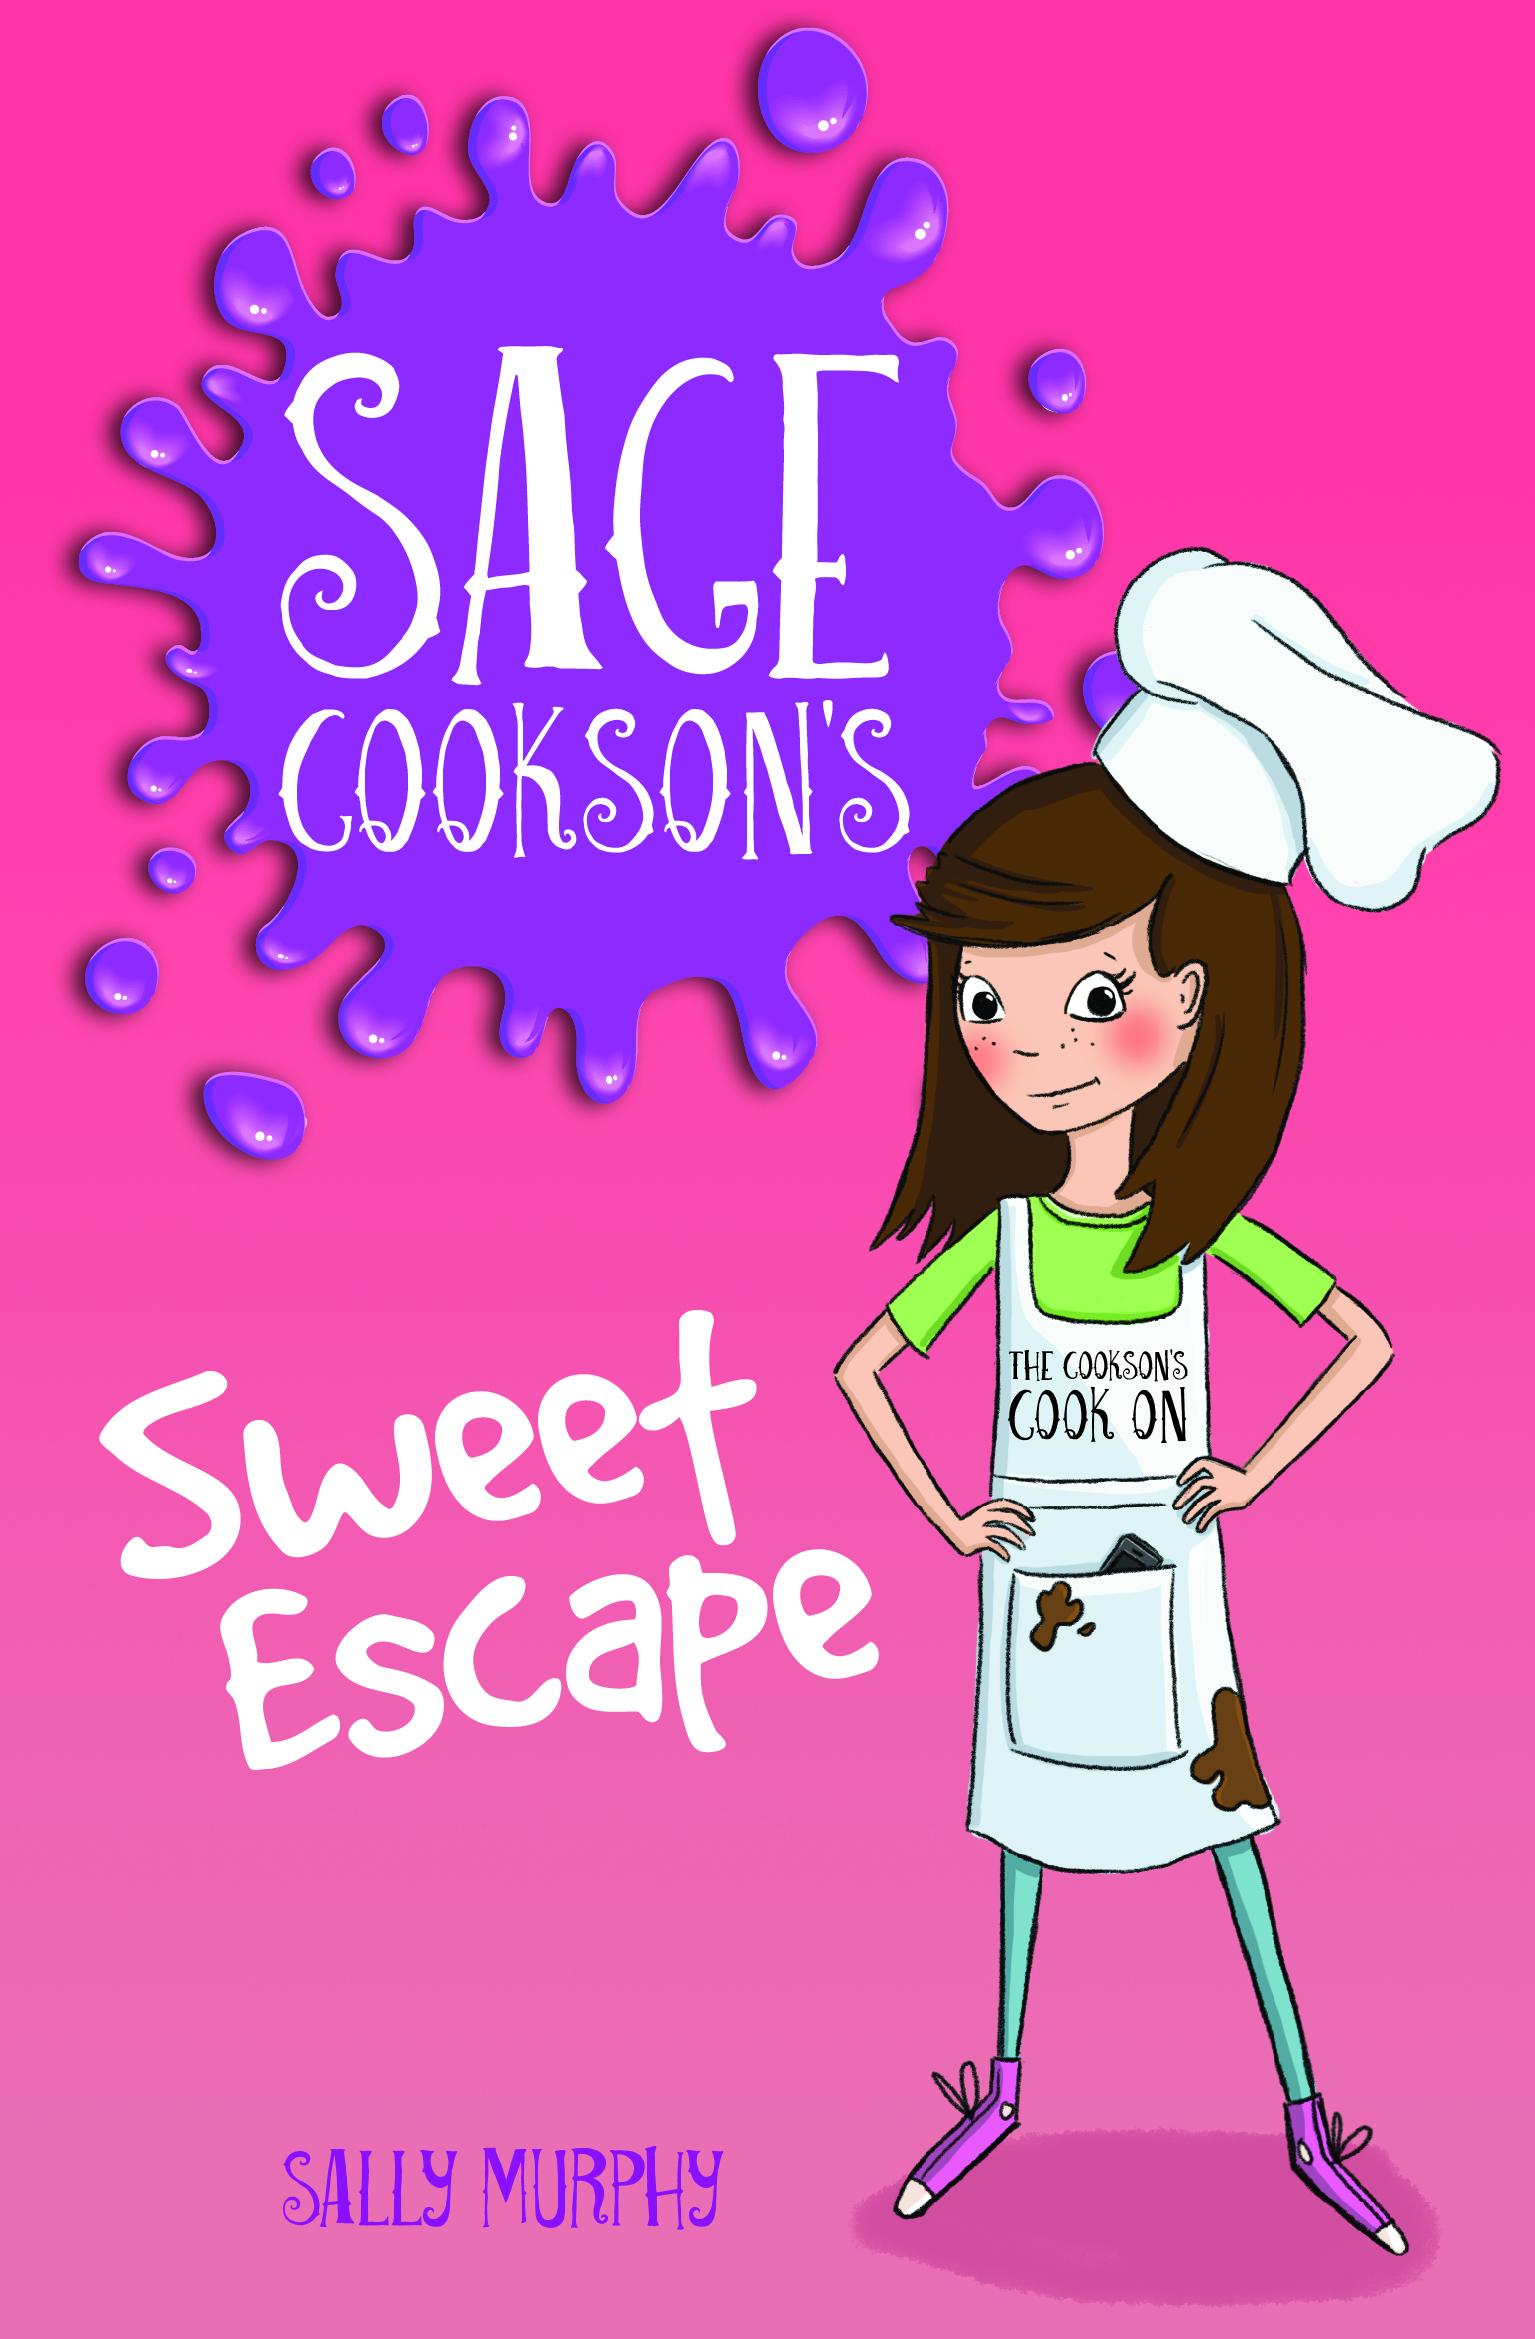 1121-20160701065920-cover_sage-cookson_sweet-escape